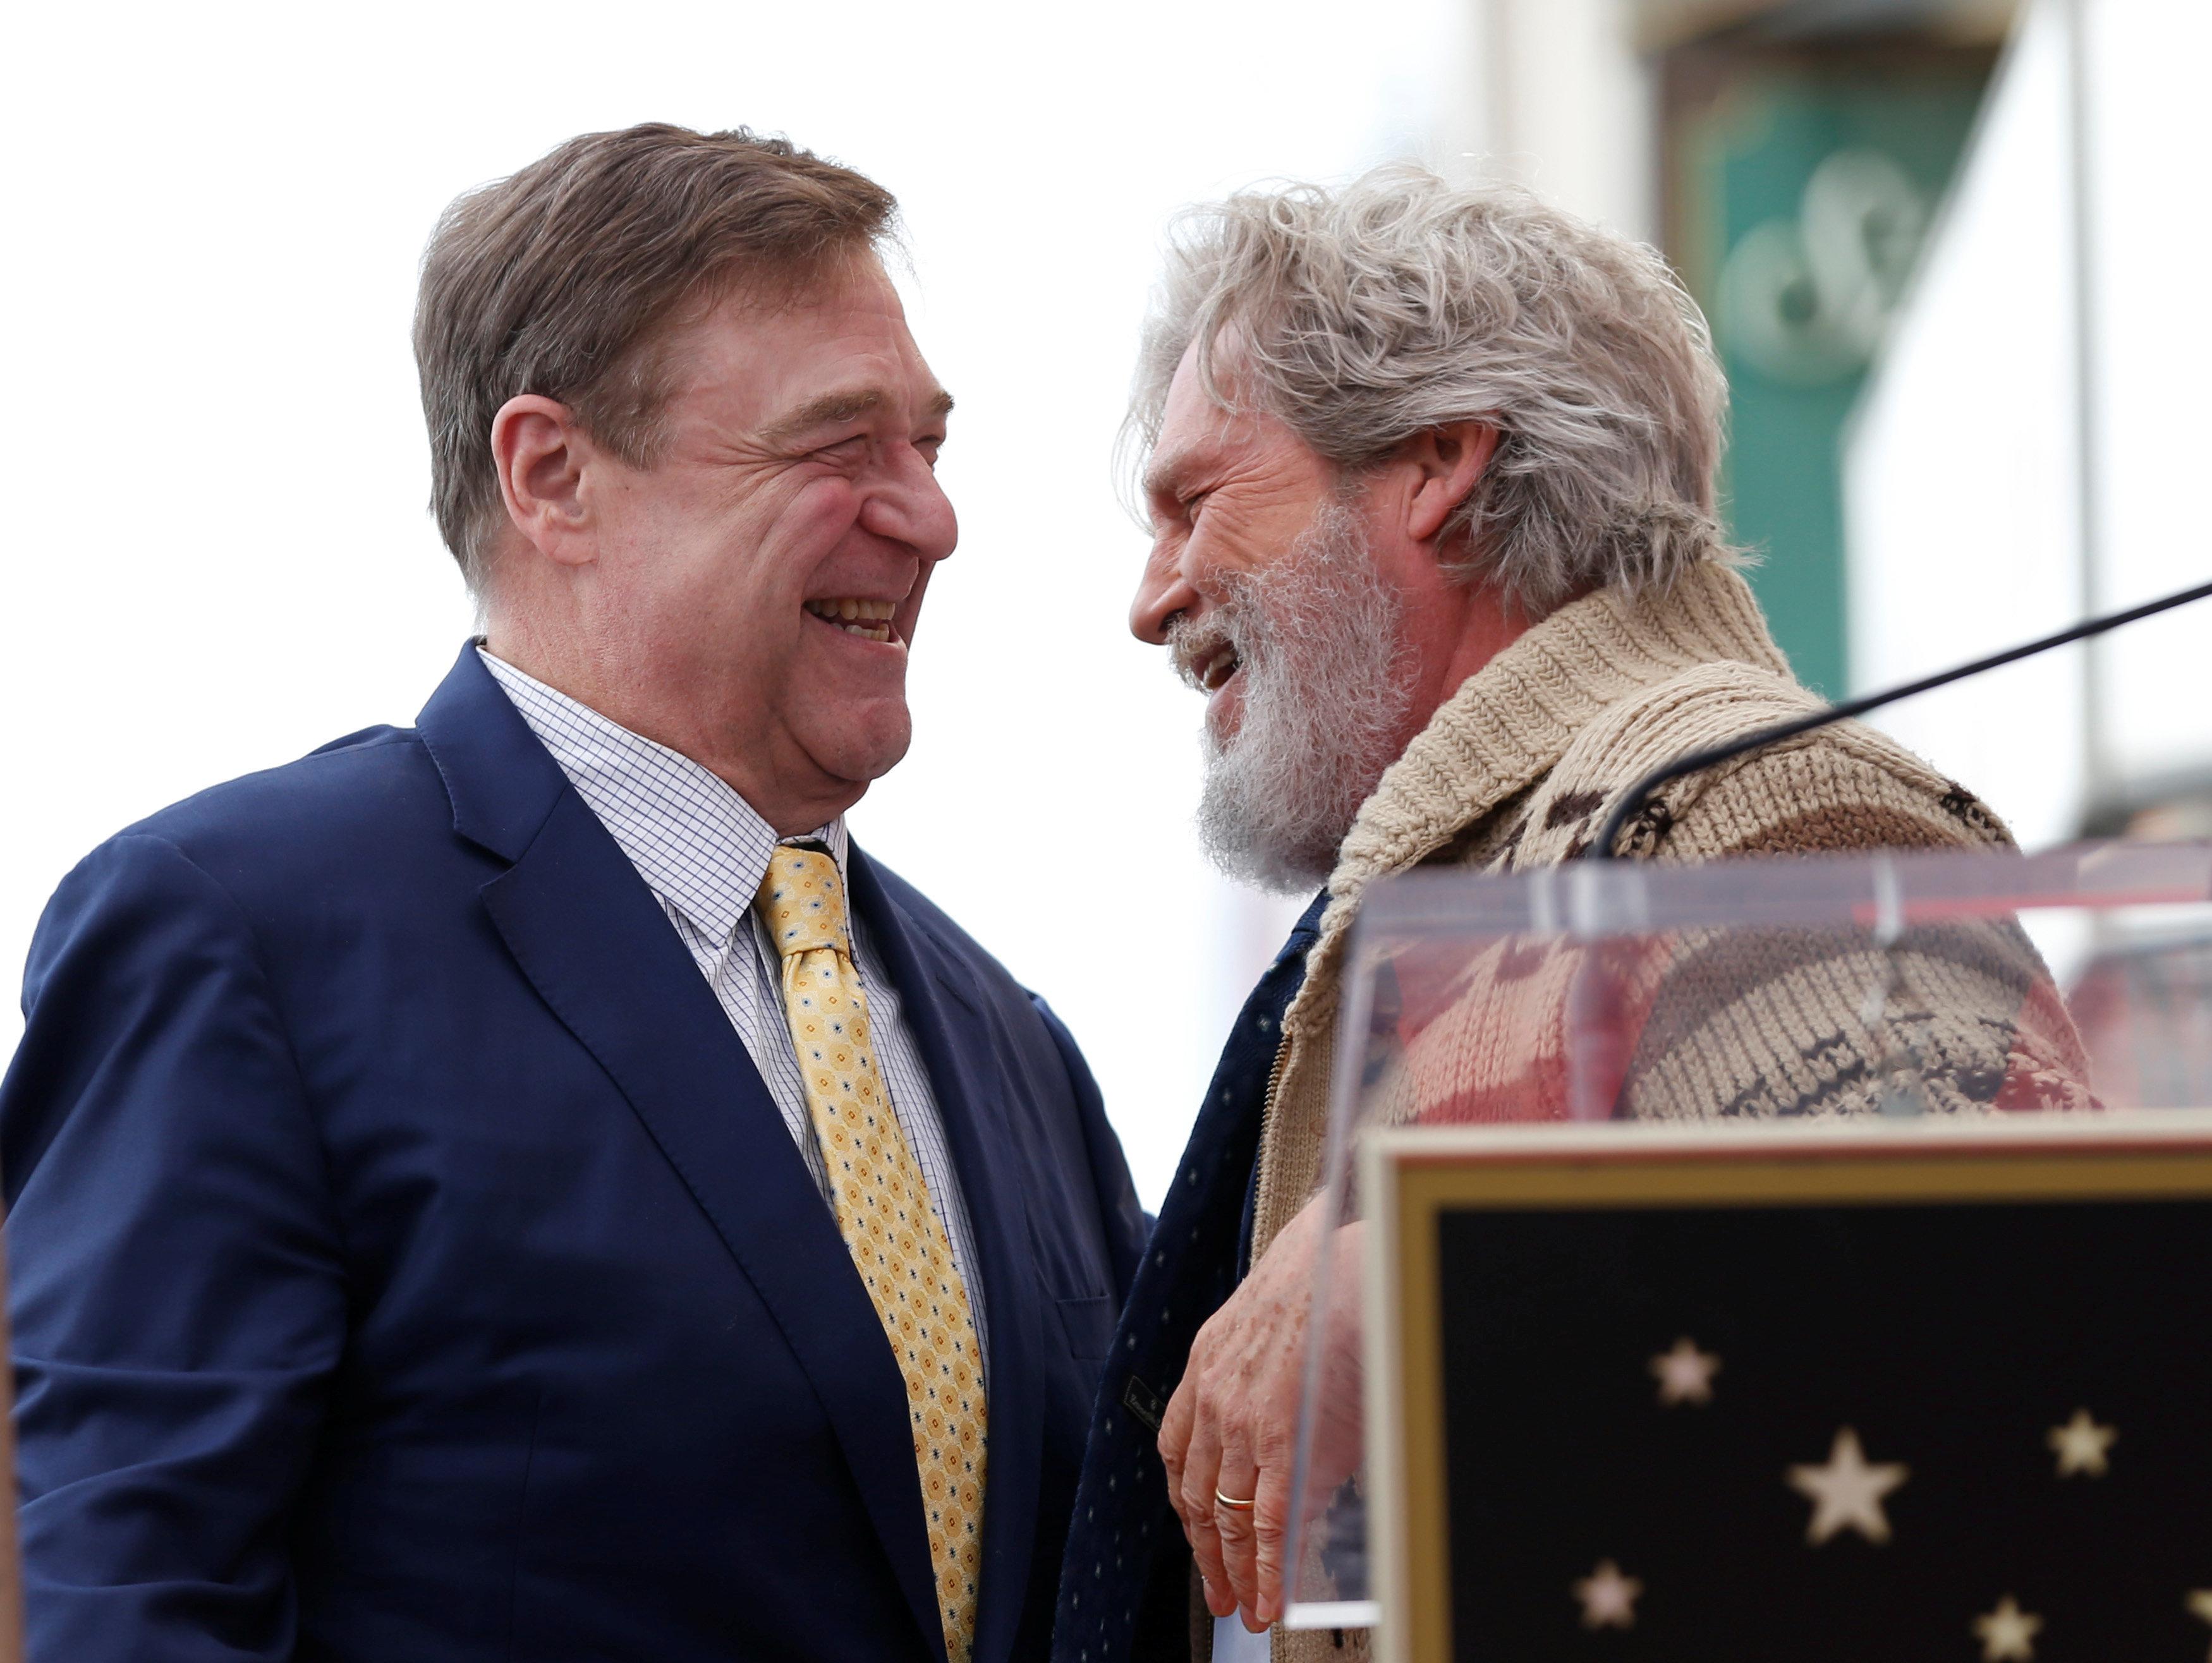 Jeff Bridges Reprises 'Lebowski' Character For John Goodman's Walk Of Fame